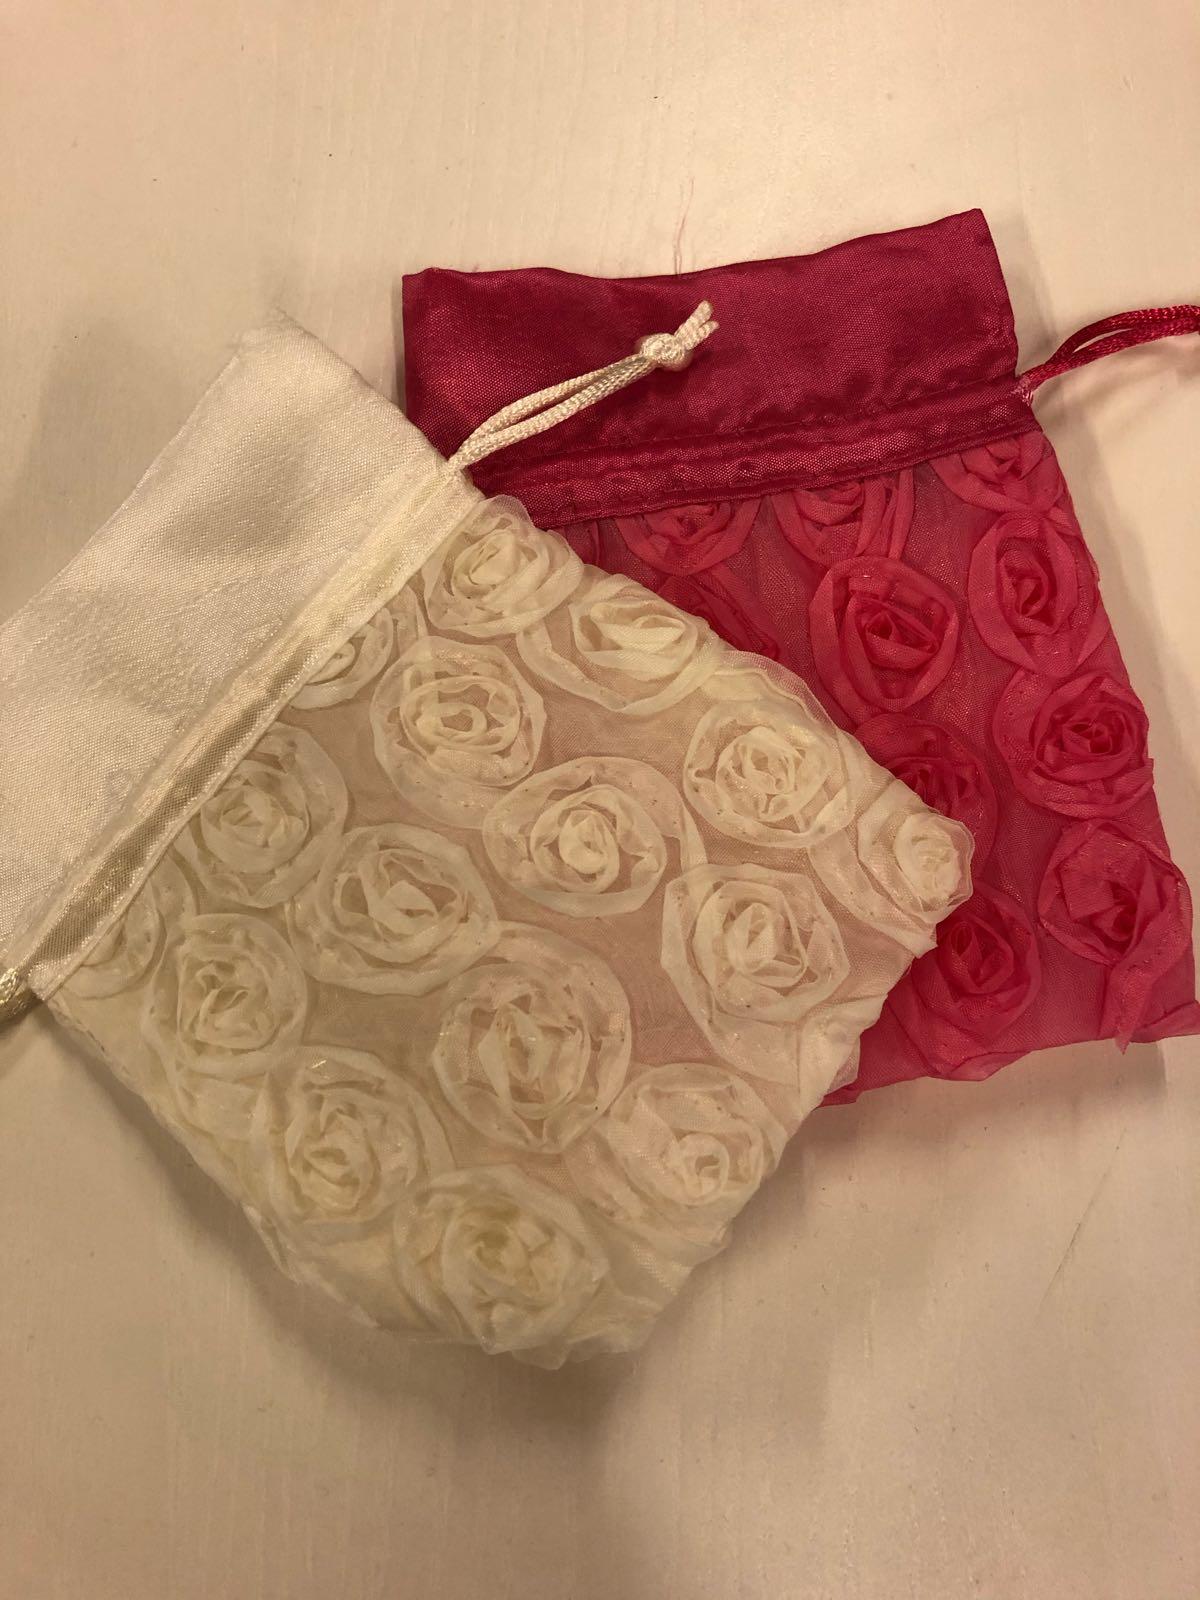 Dice Bag Rosé